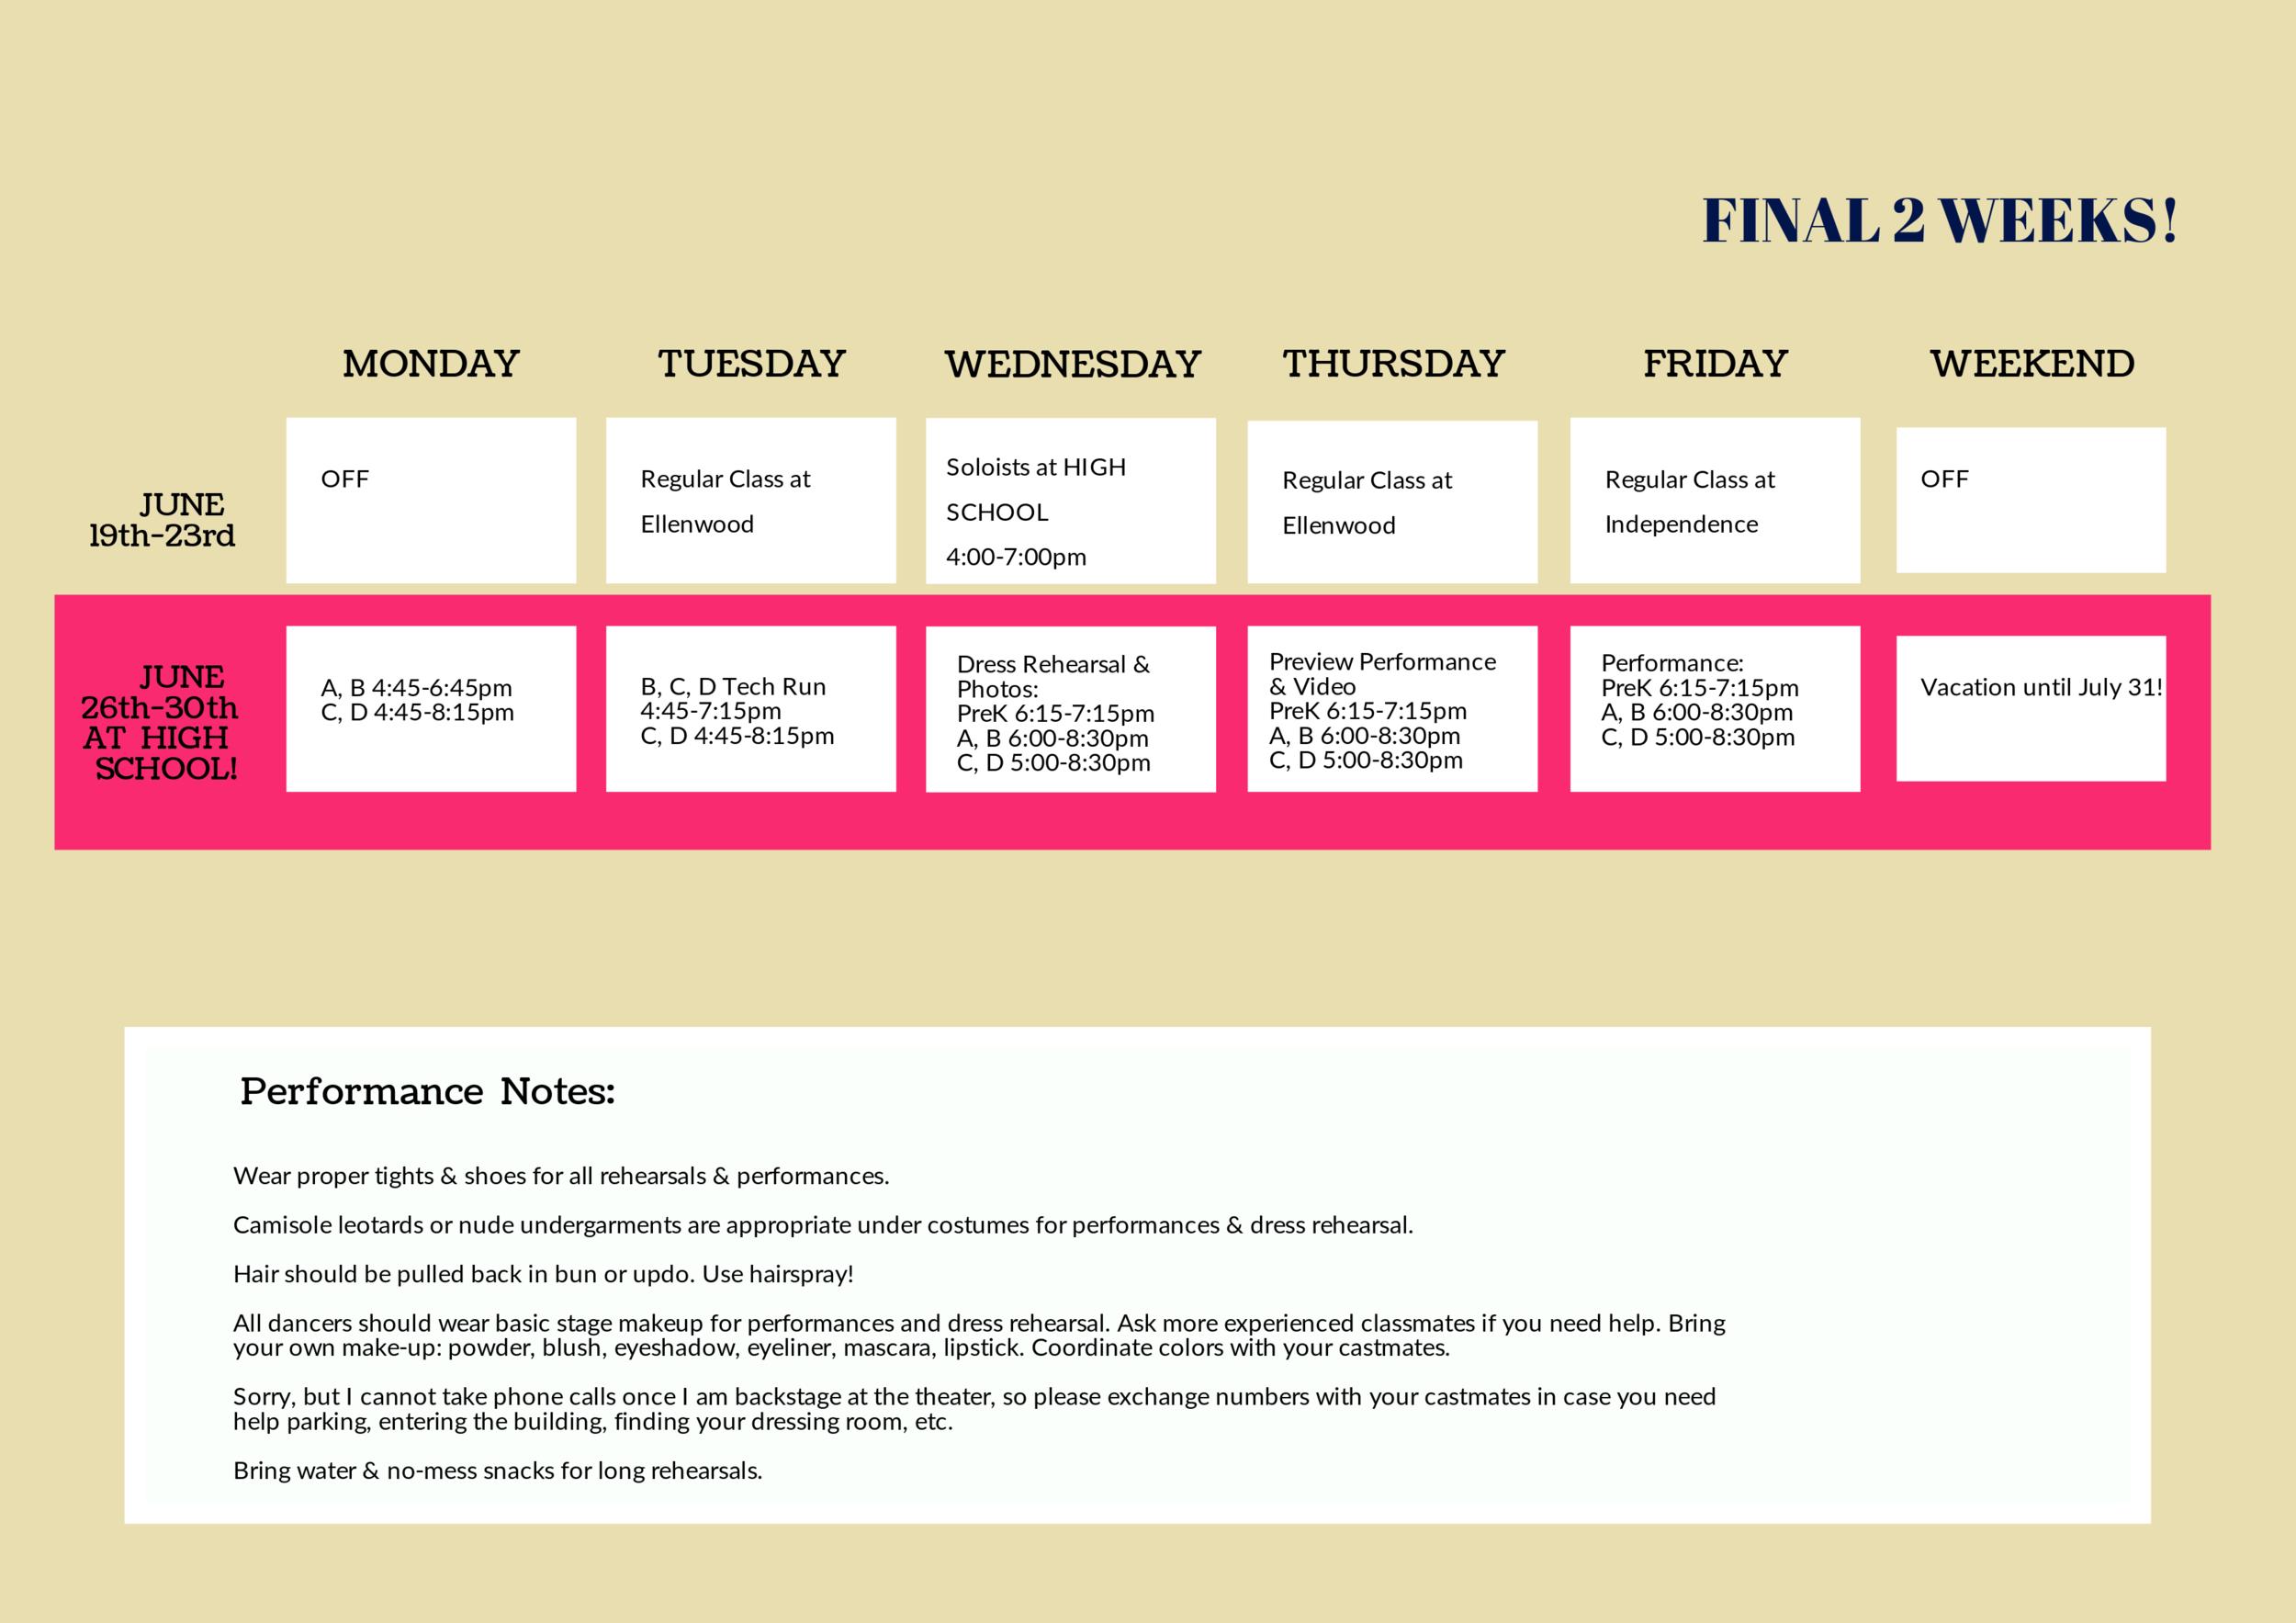 final-schedule-for-beauty--the-beast_1497898391430.jpg